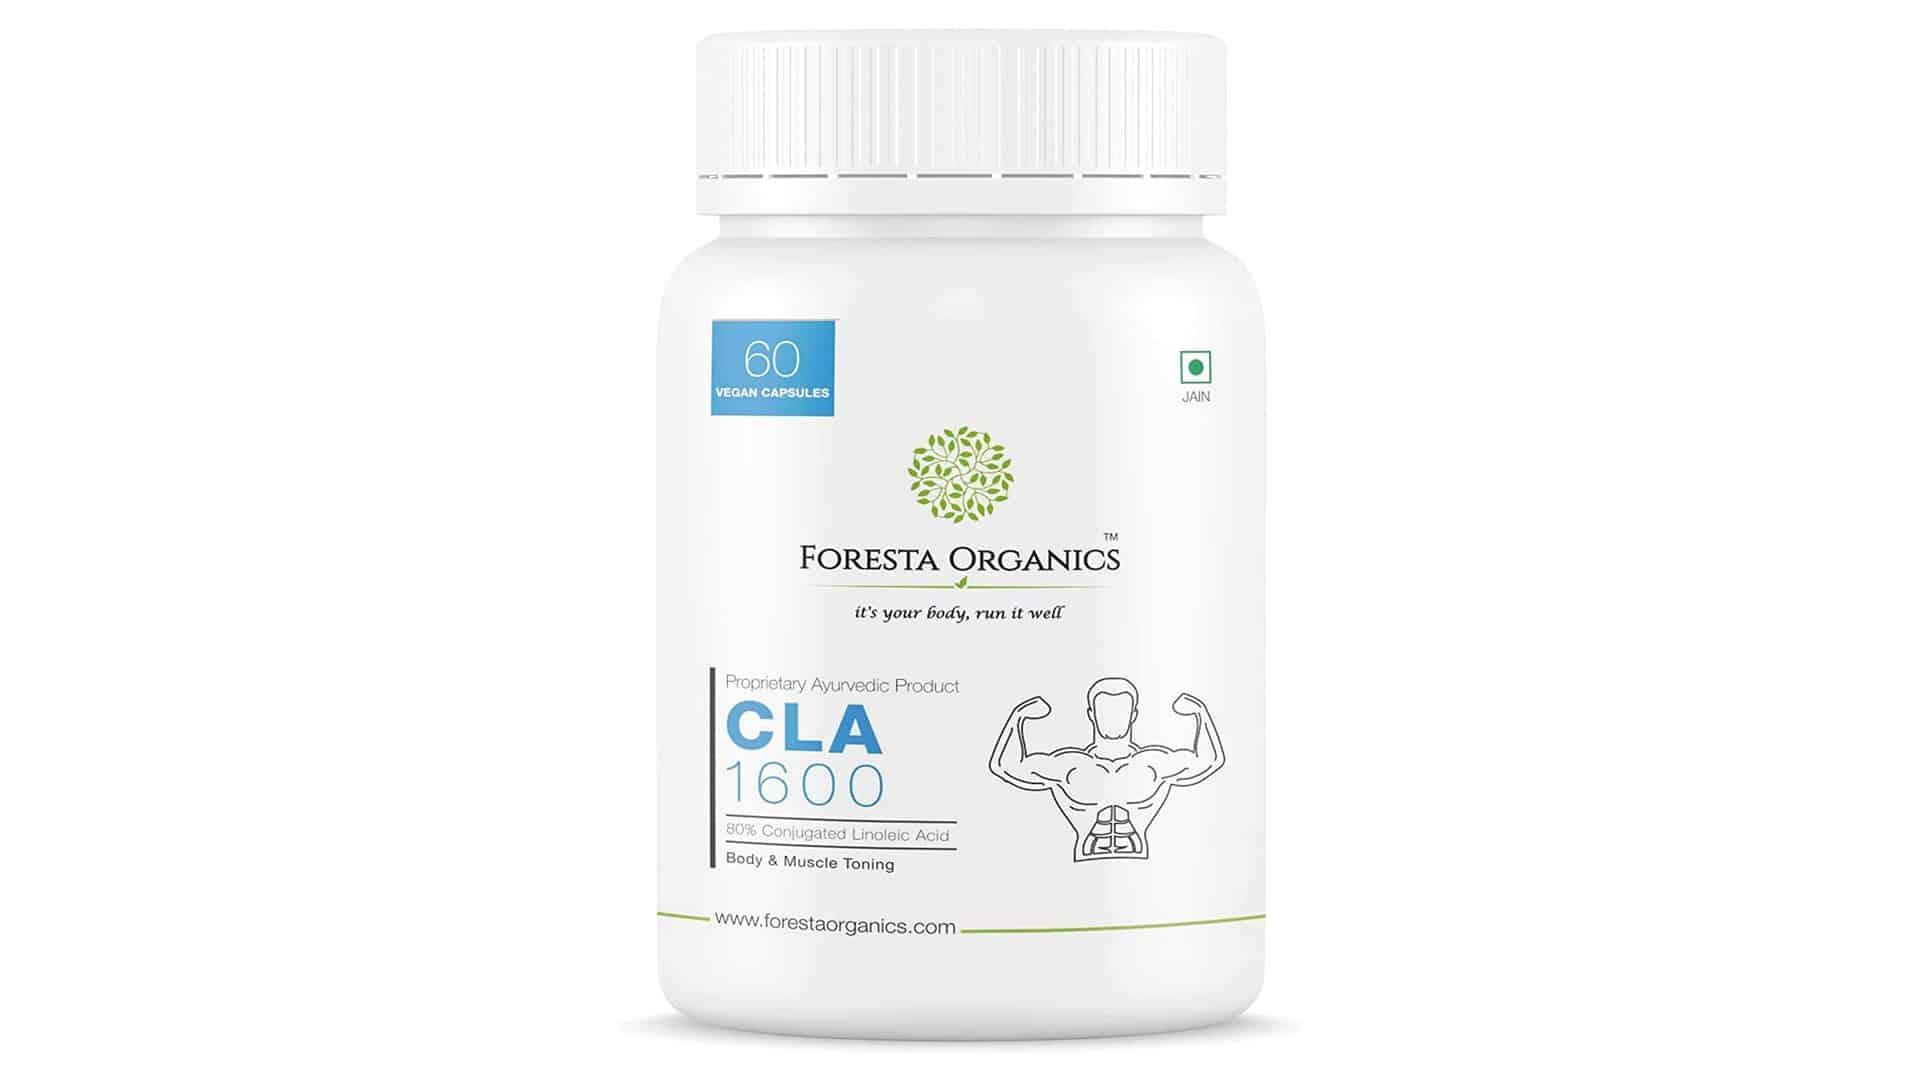 Foresta Organics